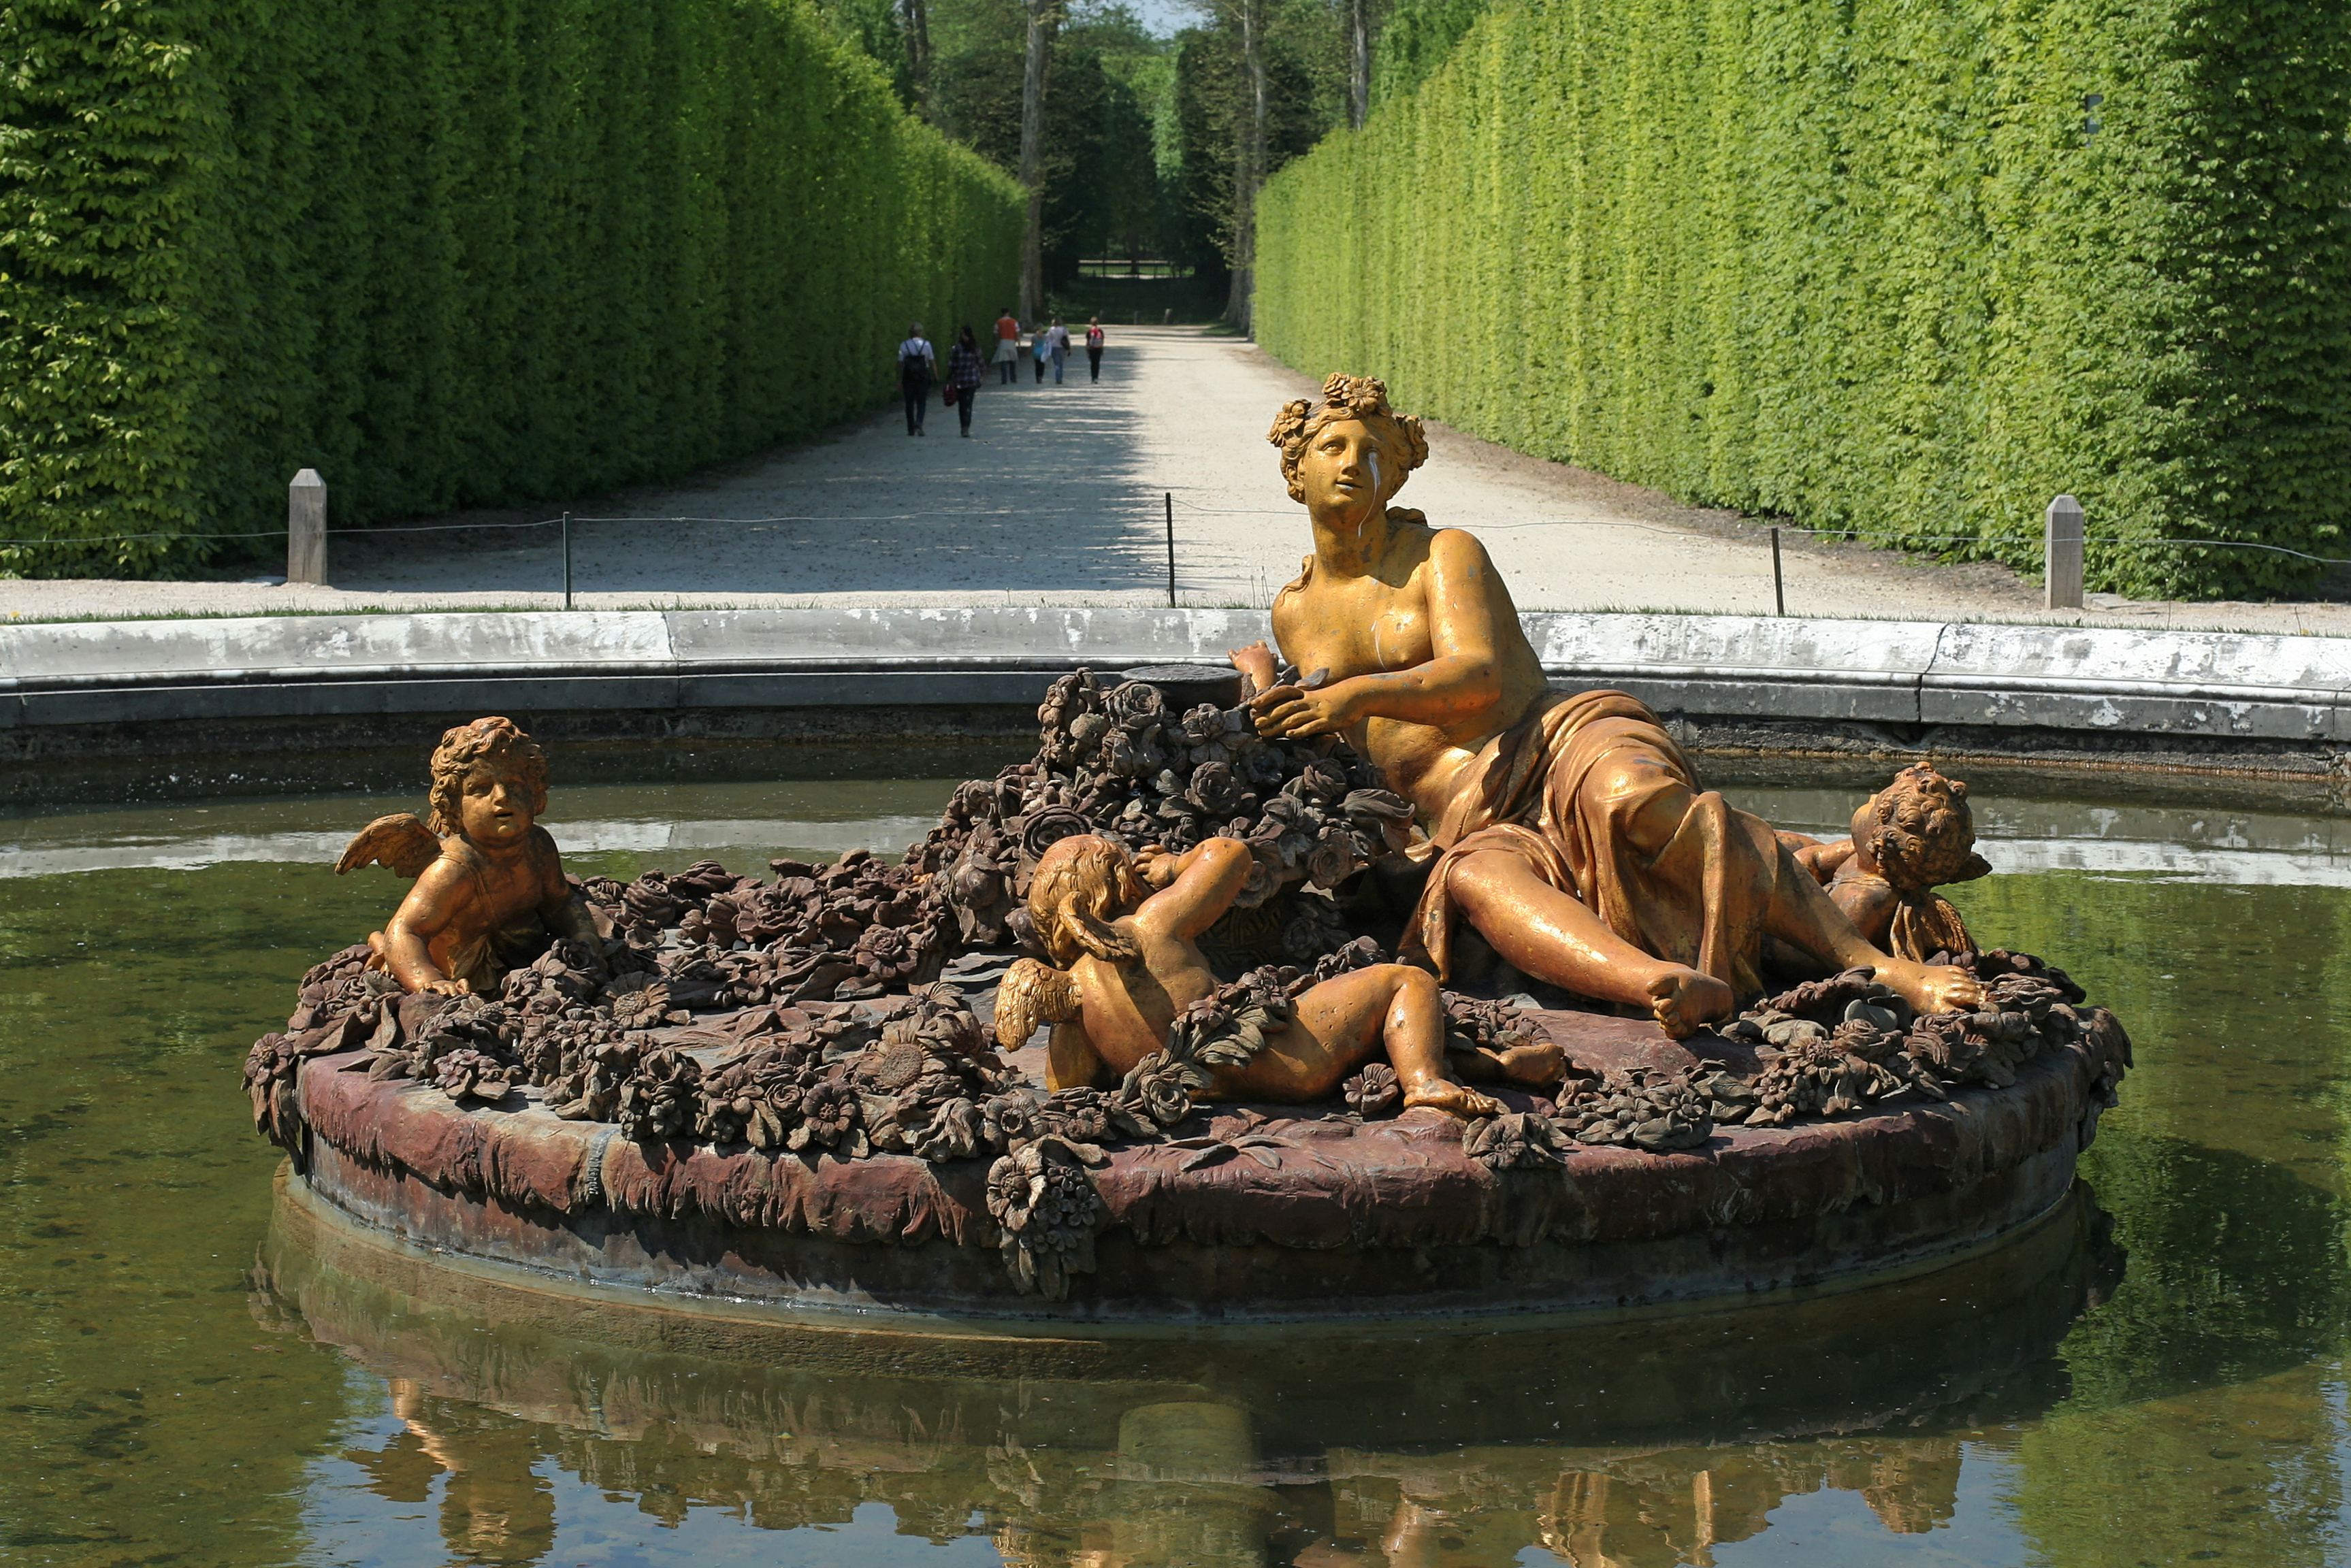 Design bassin avec fontaine saint denis 1338 bassin saint denis - Petit bassin exterieur saint denis ...